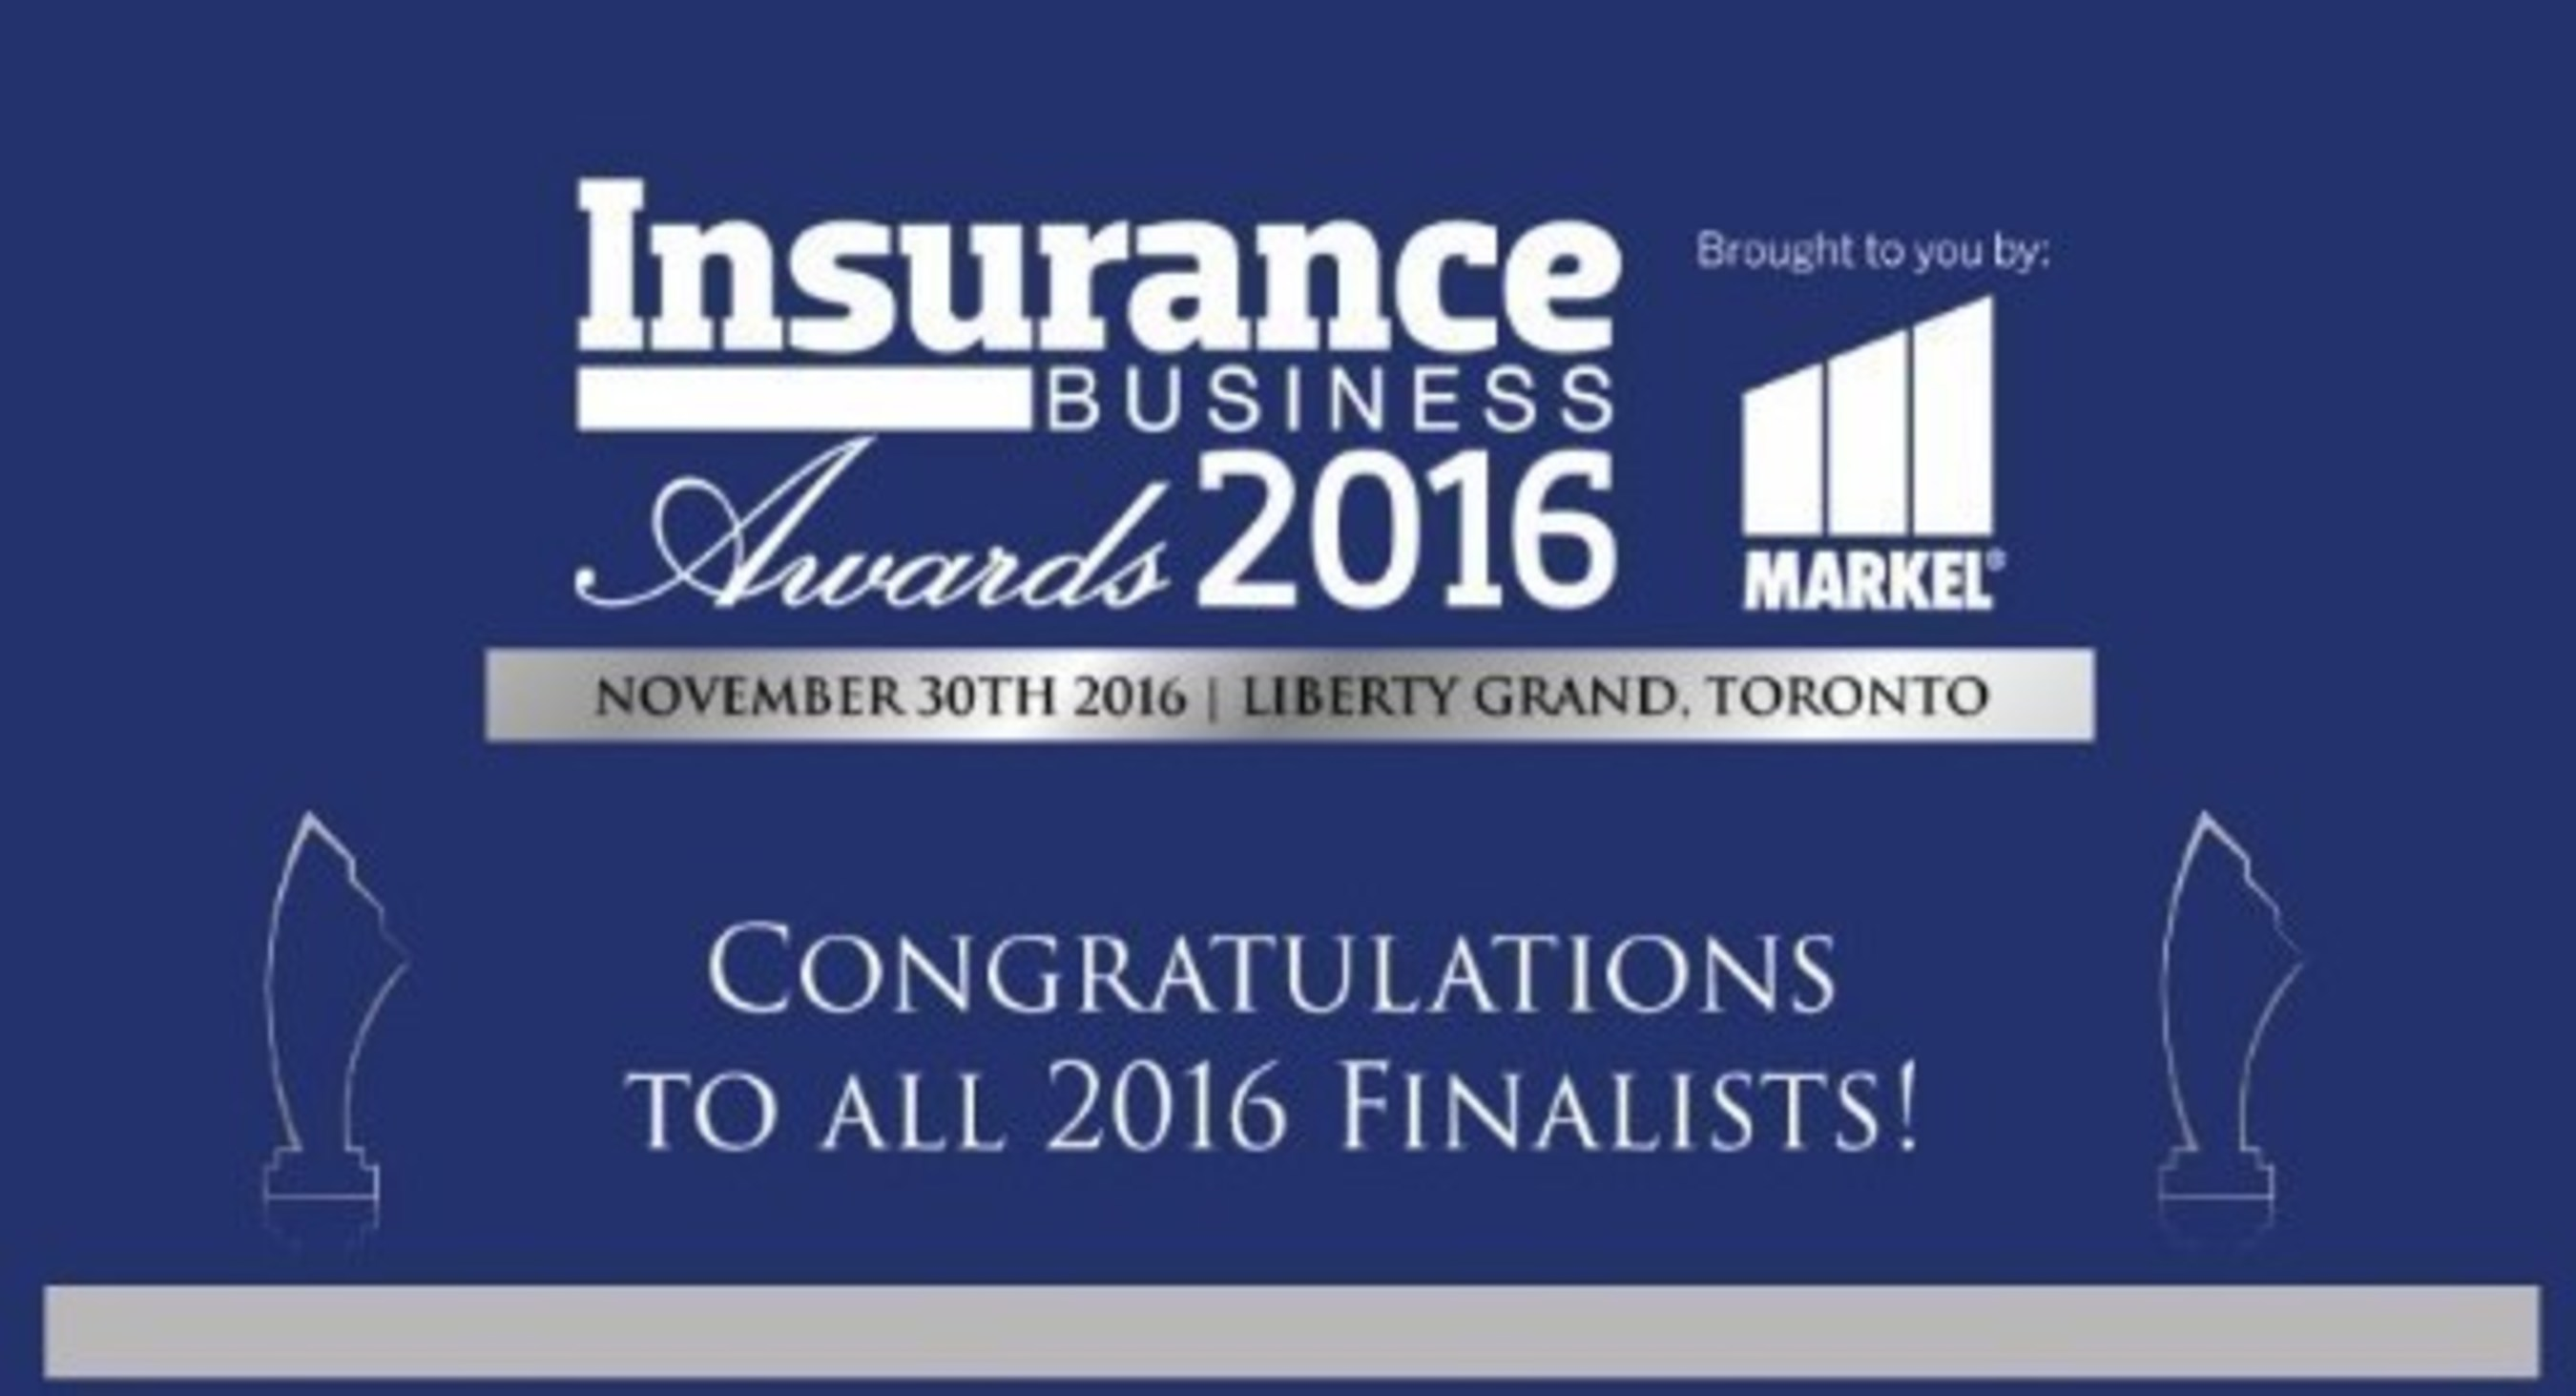 Insurance Business Awards